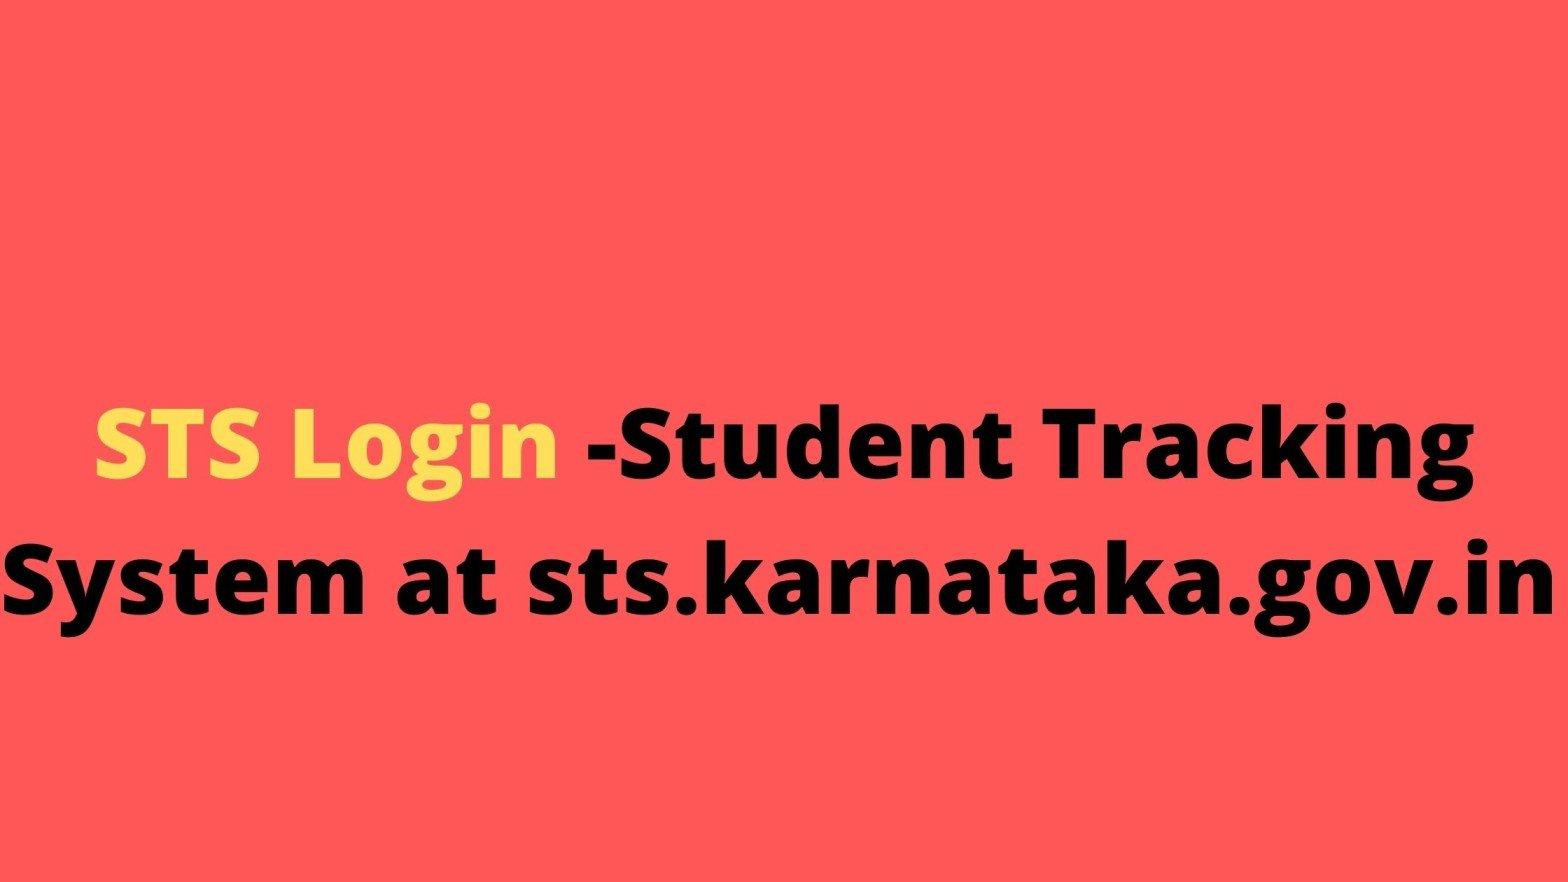 STS Login -Student Tracking System at sts.karnataka.gov.in